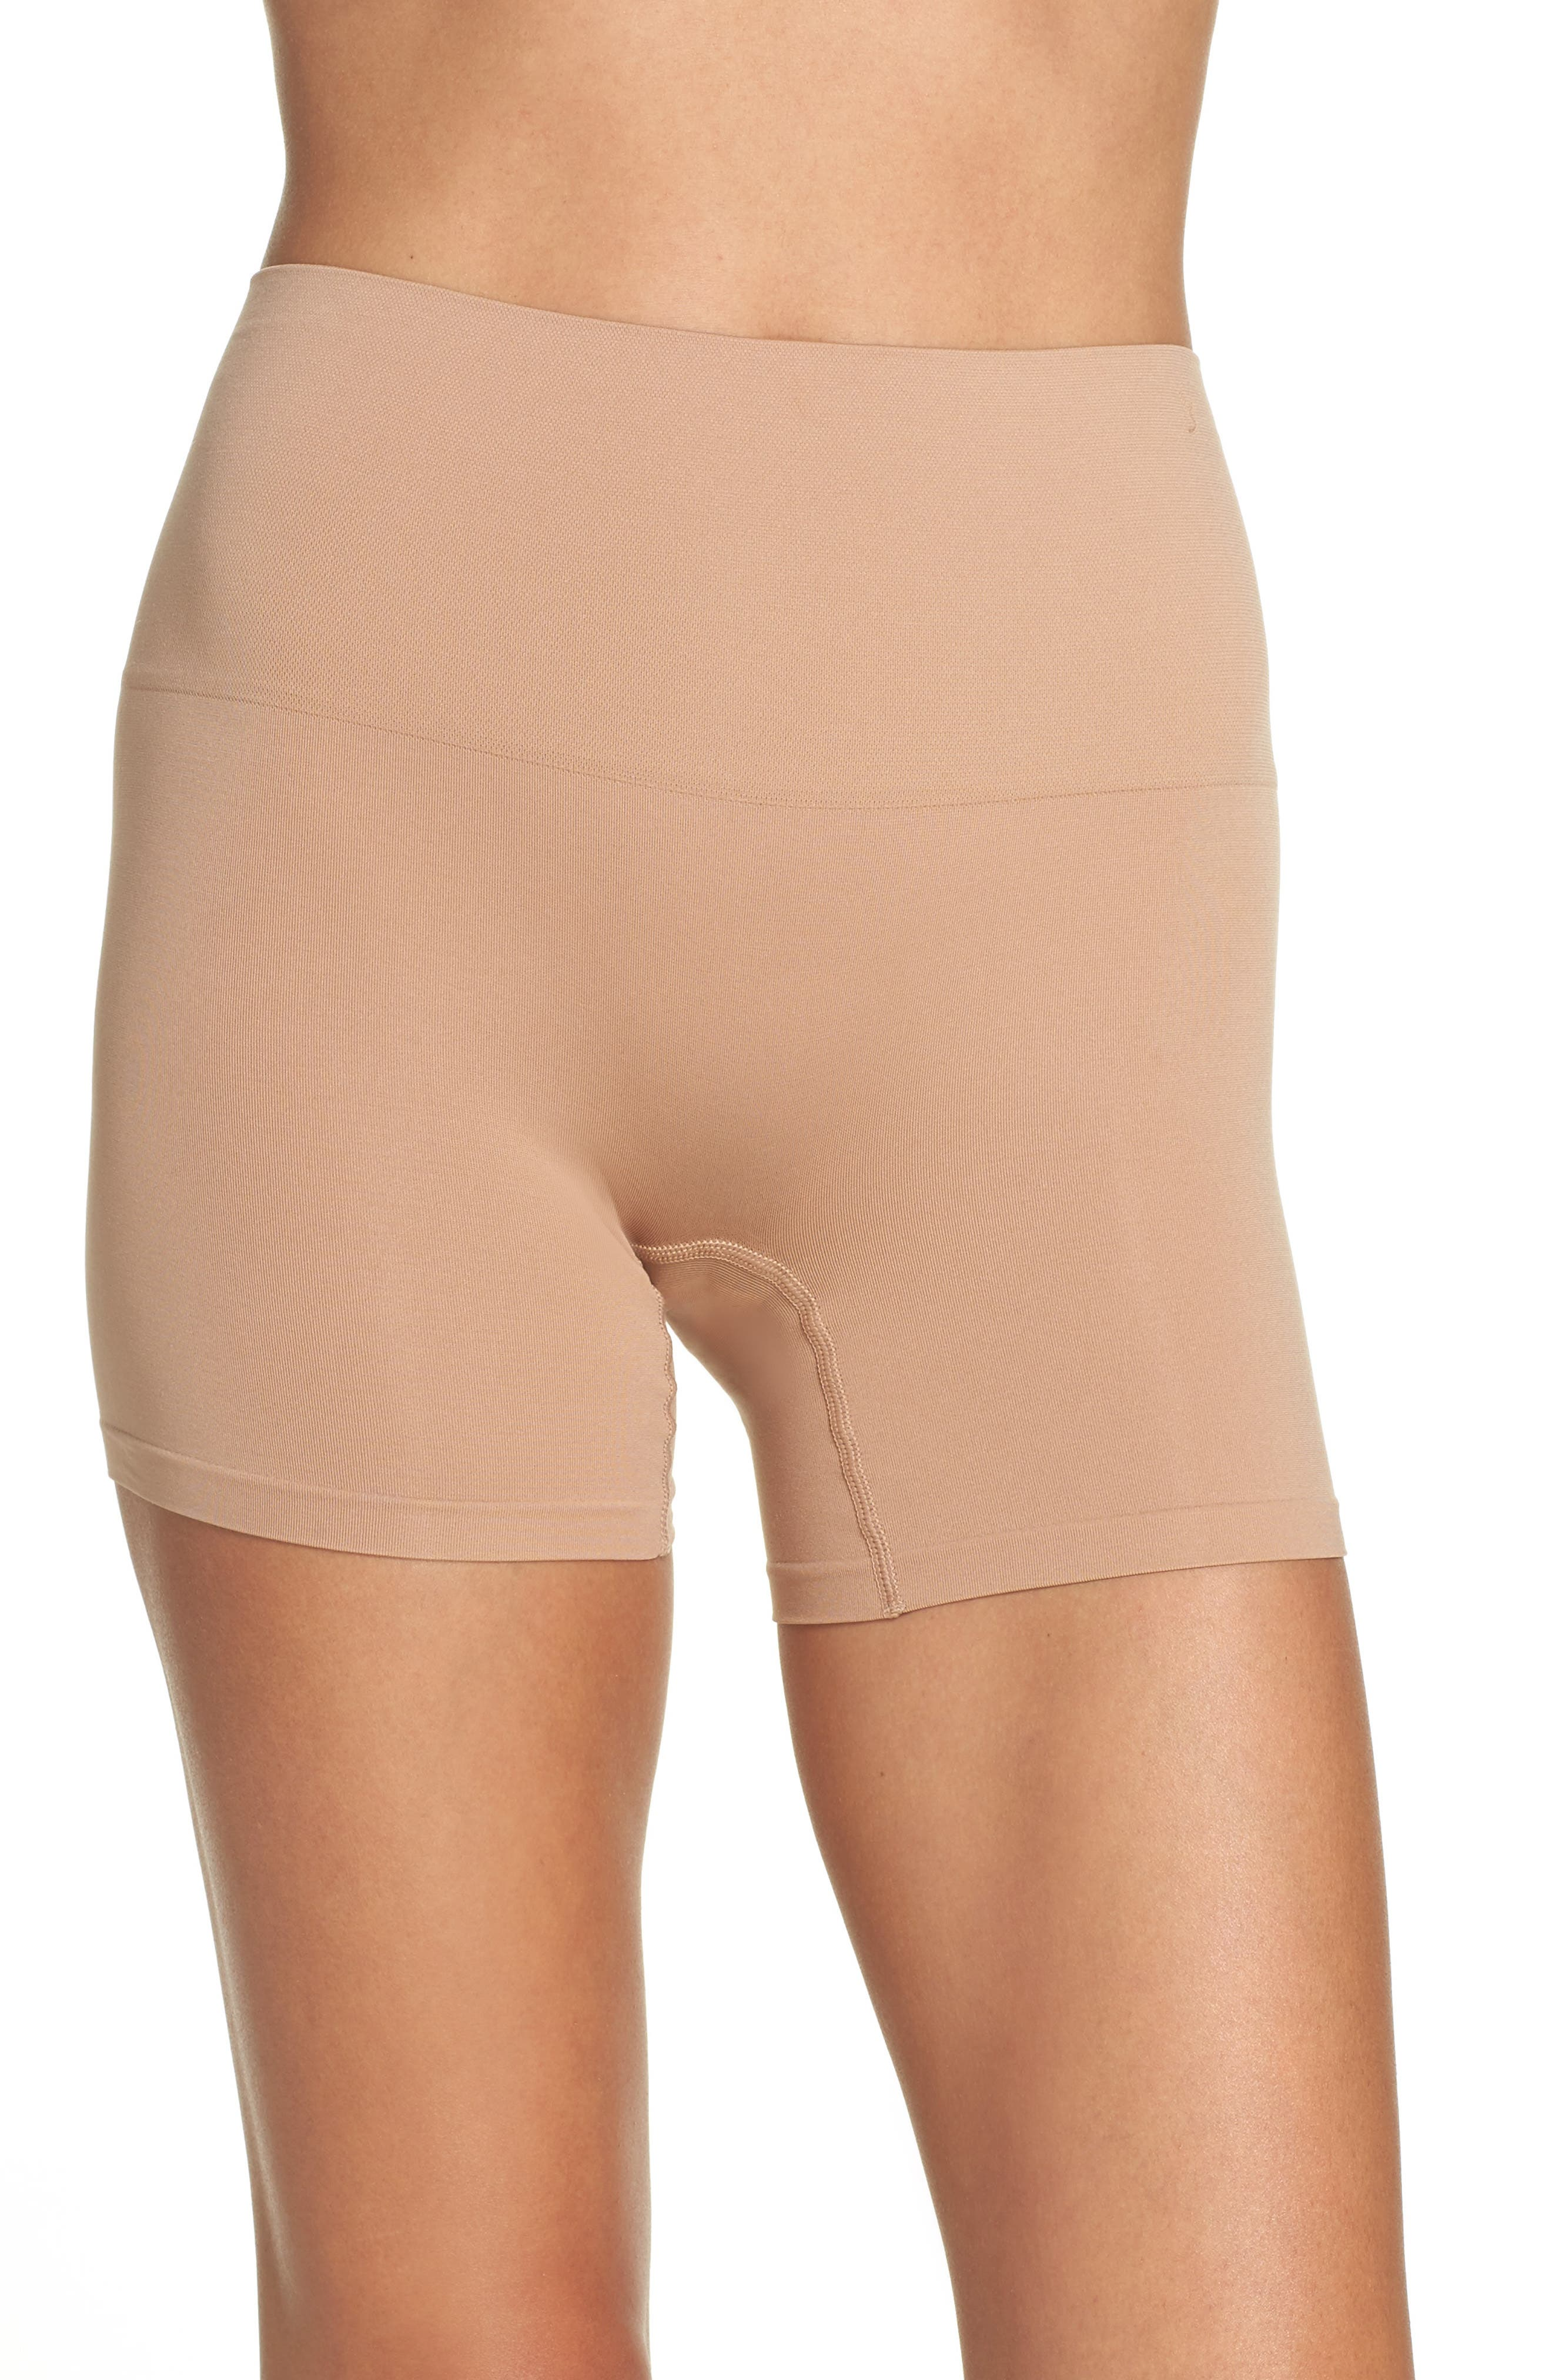 Main Image - Yummie Ultralight Seamless Shaping Shorts (2 for $30)